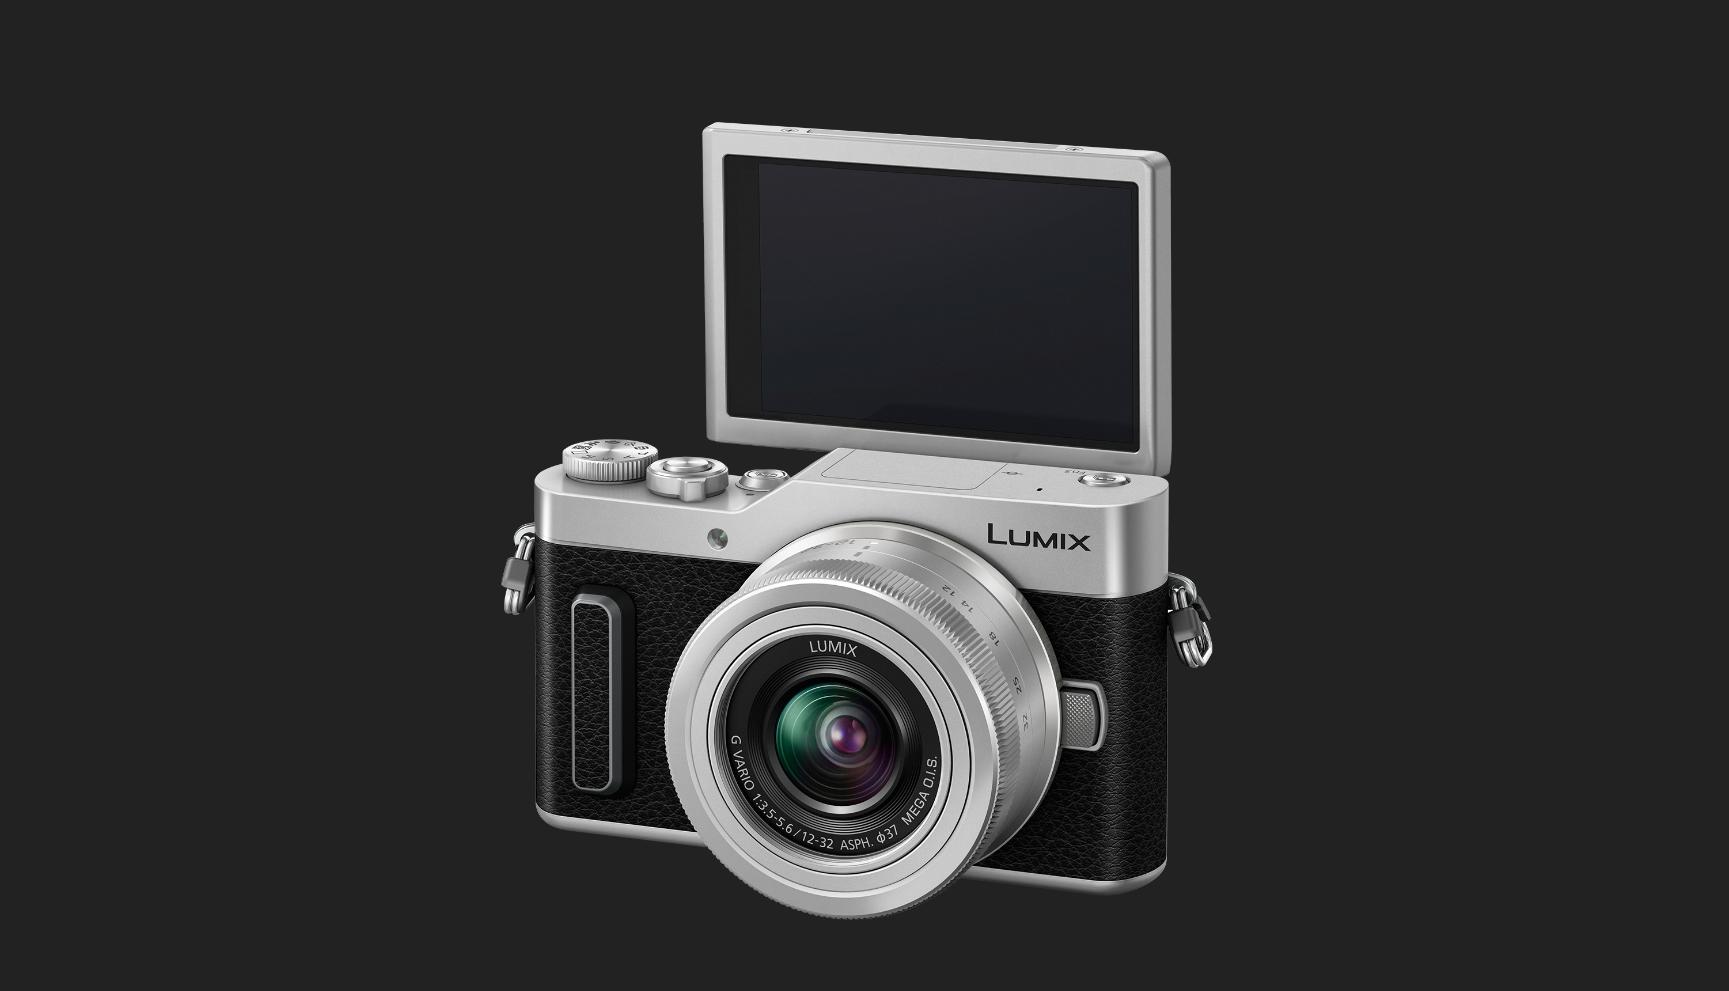 panasonic lumix g880